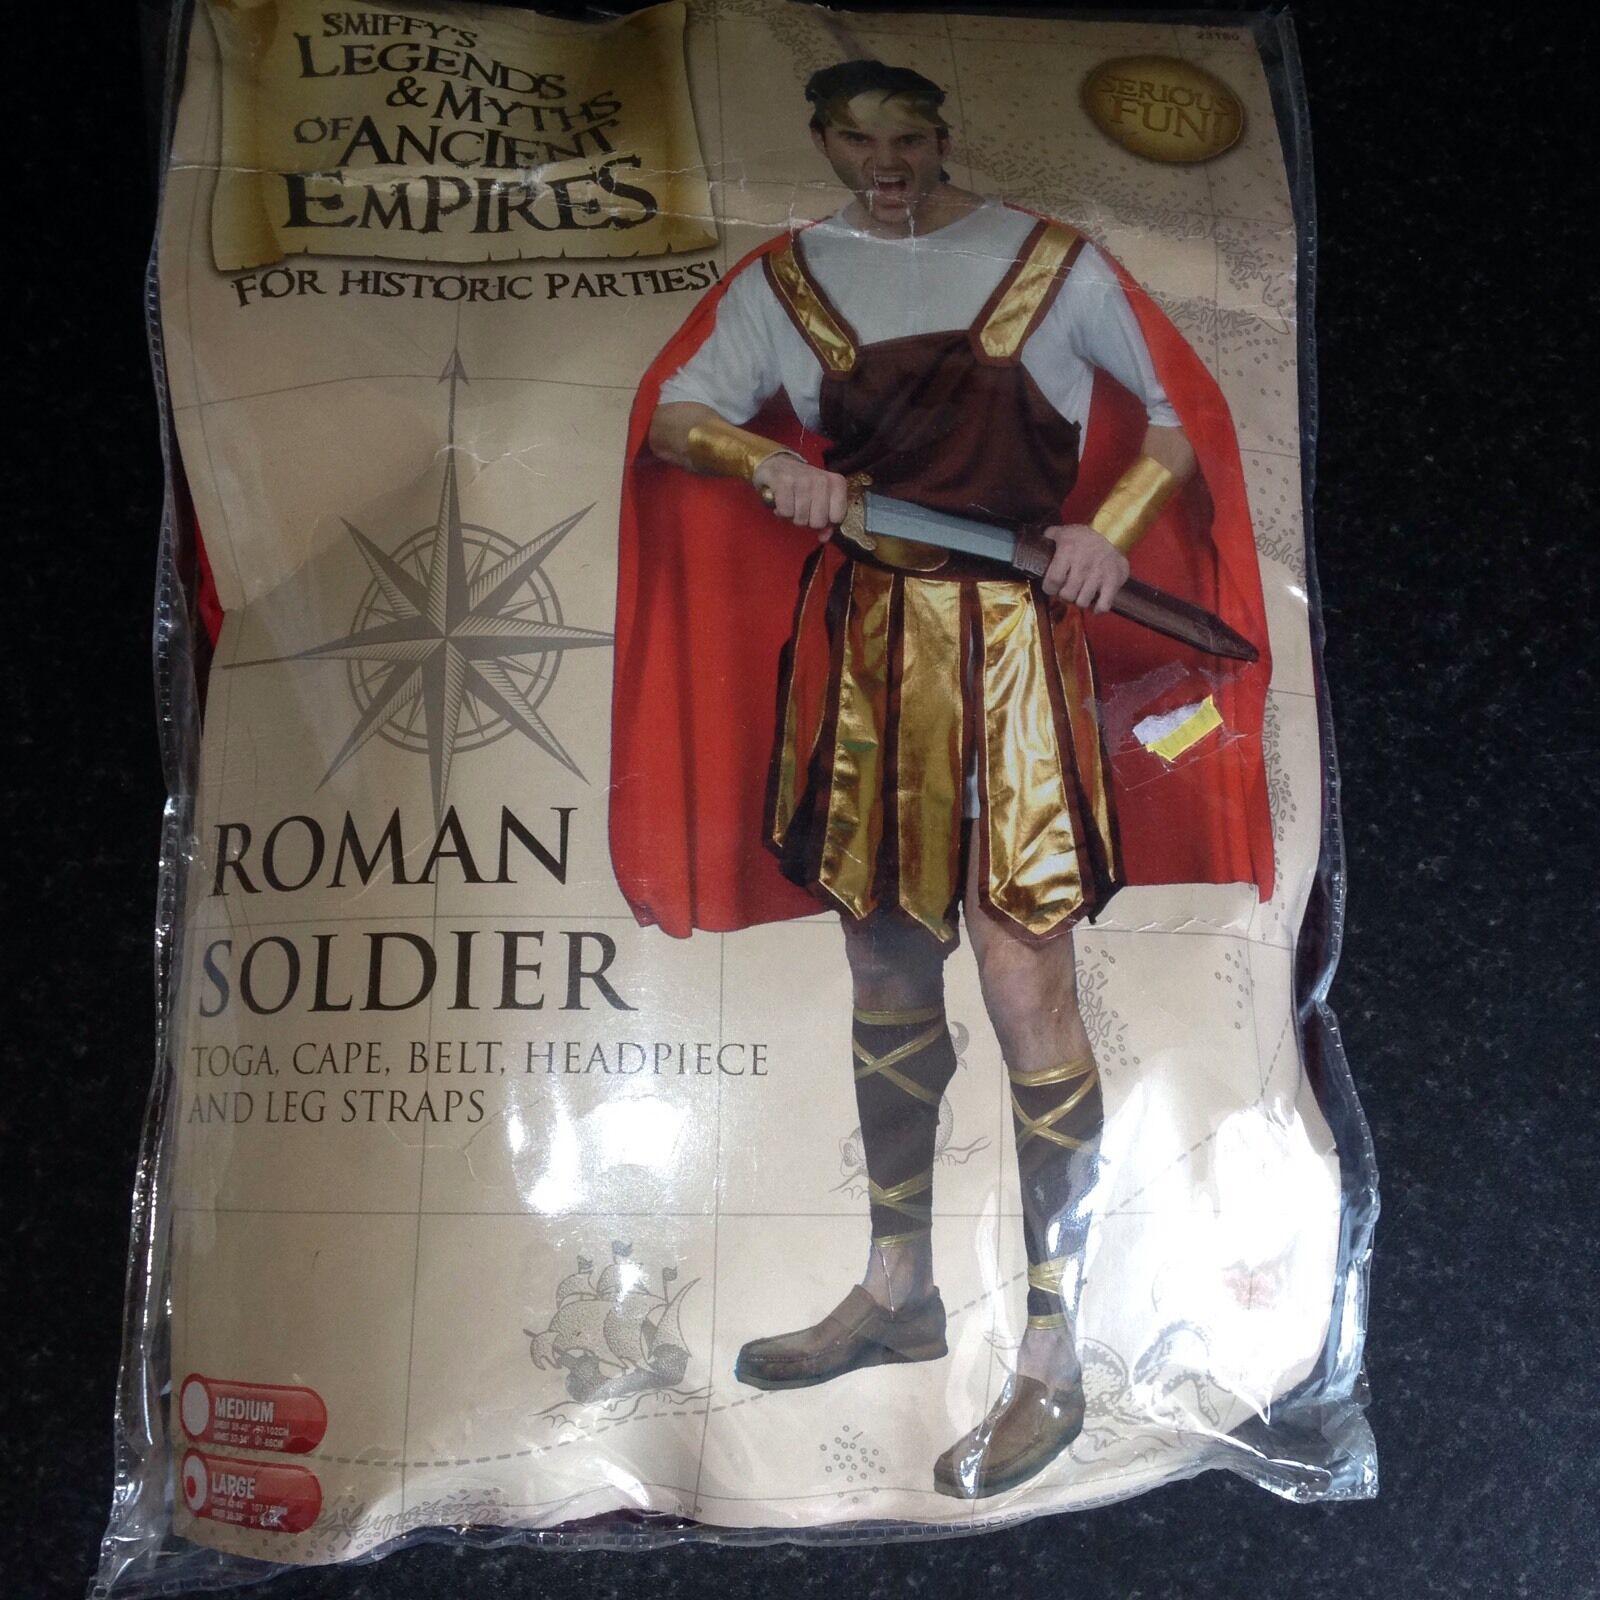 Smiffys ROMAN SOLDIER Legends Myths Fancy Dress Costume Adult Male Mens Toga Etc